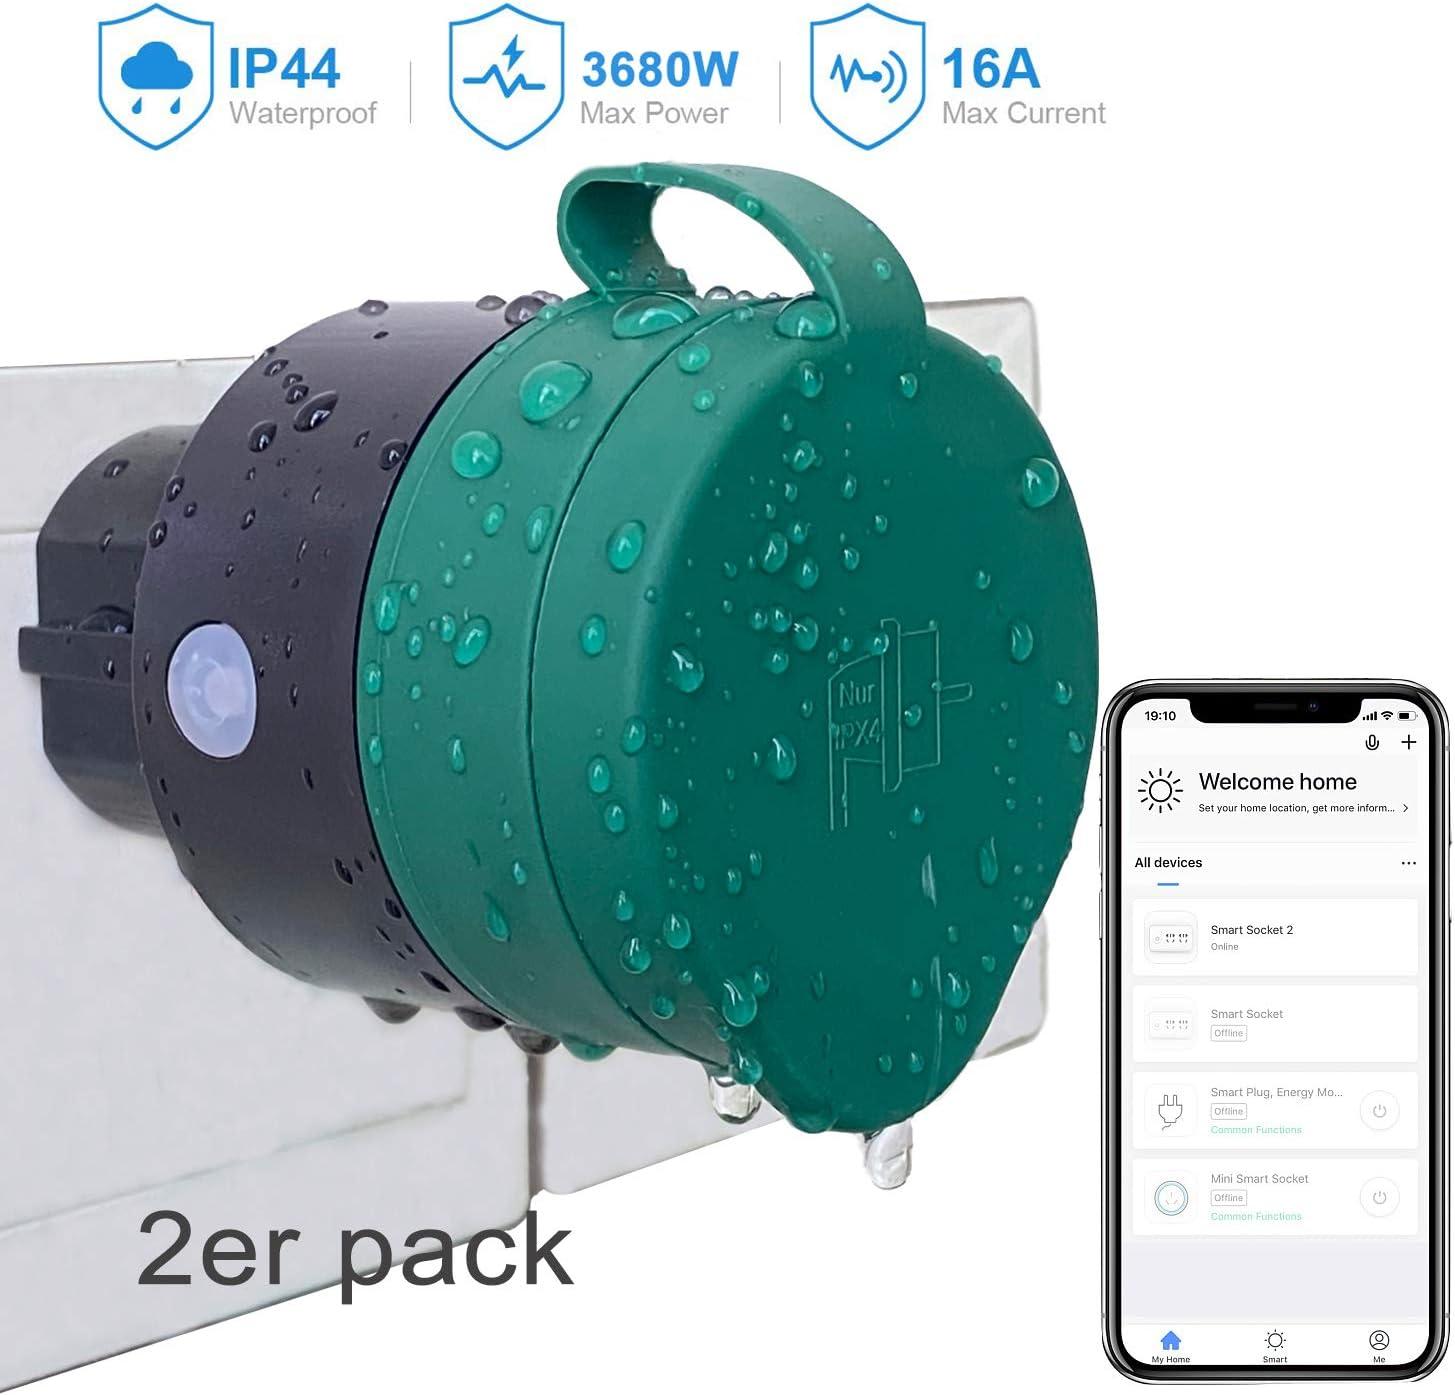 2er Pack UCOMEN Outdoor Sockets WLAN Smart Steckdose WiFi Stecker Smart Plug Funktioniert mit  Alexa und Google Home